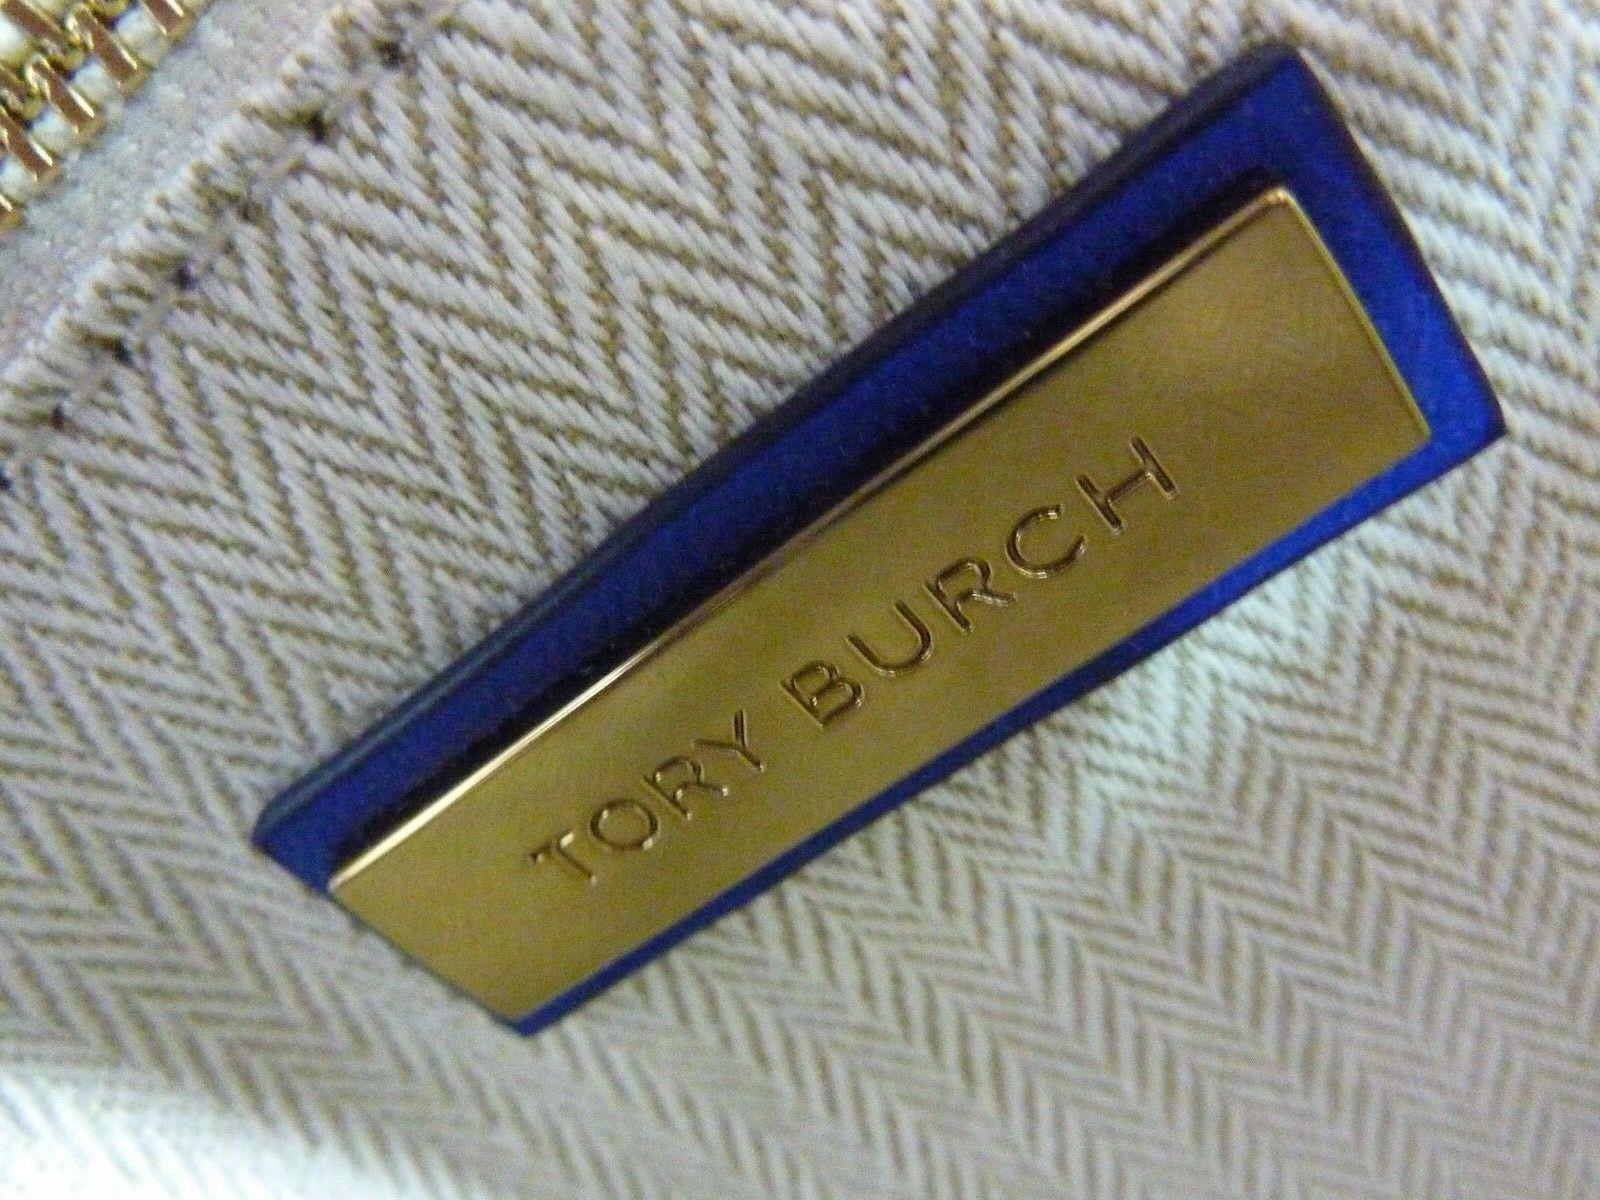 NWT Tory Burch Nautical Blue Kira Chevron Convertible Shoulder Bag image 10